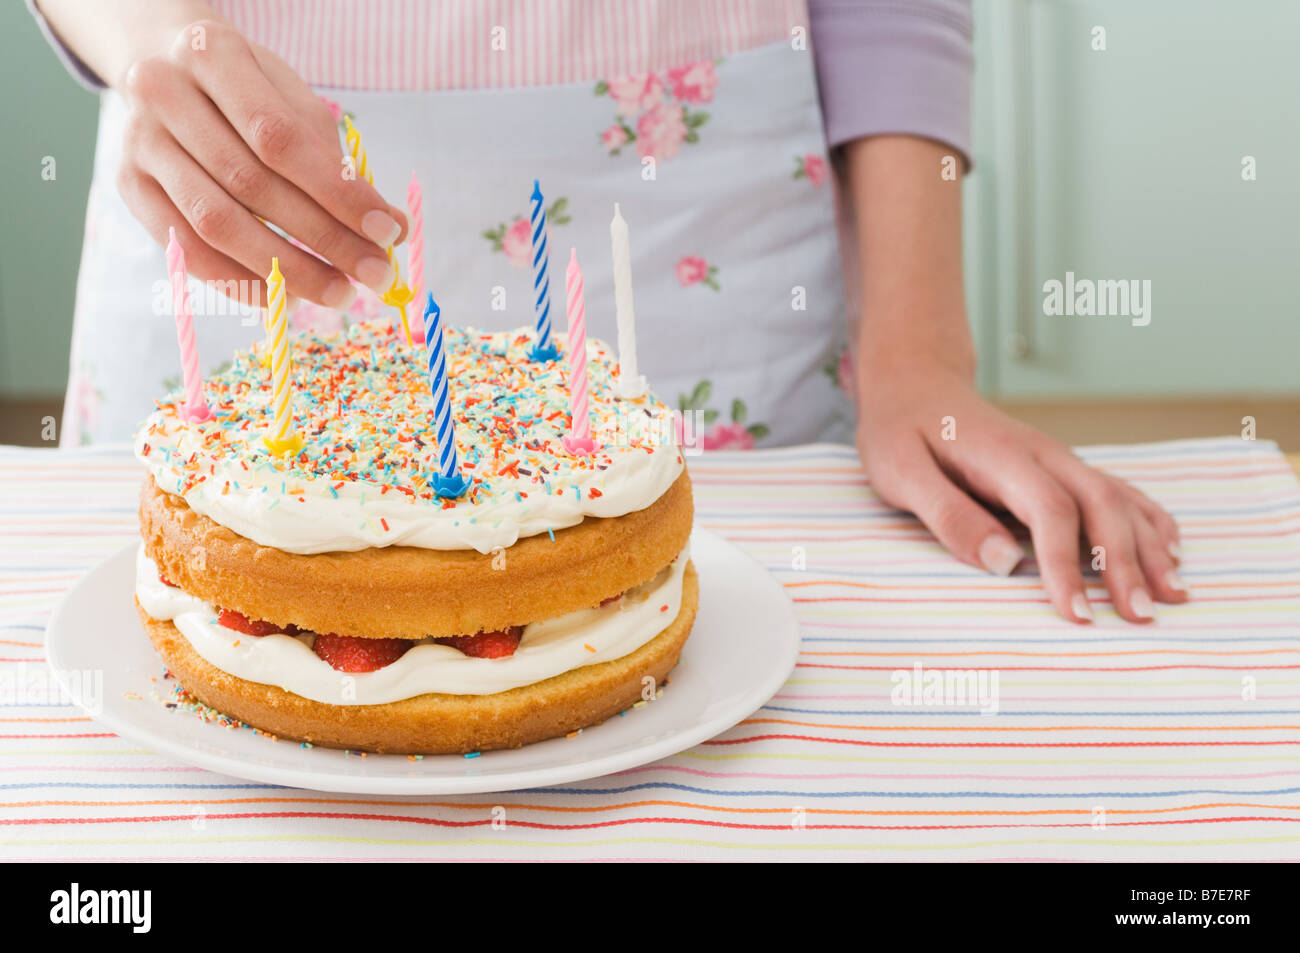 Woman with birthday cake Photo Stock